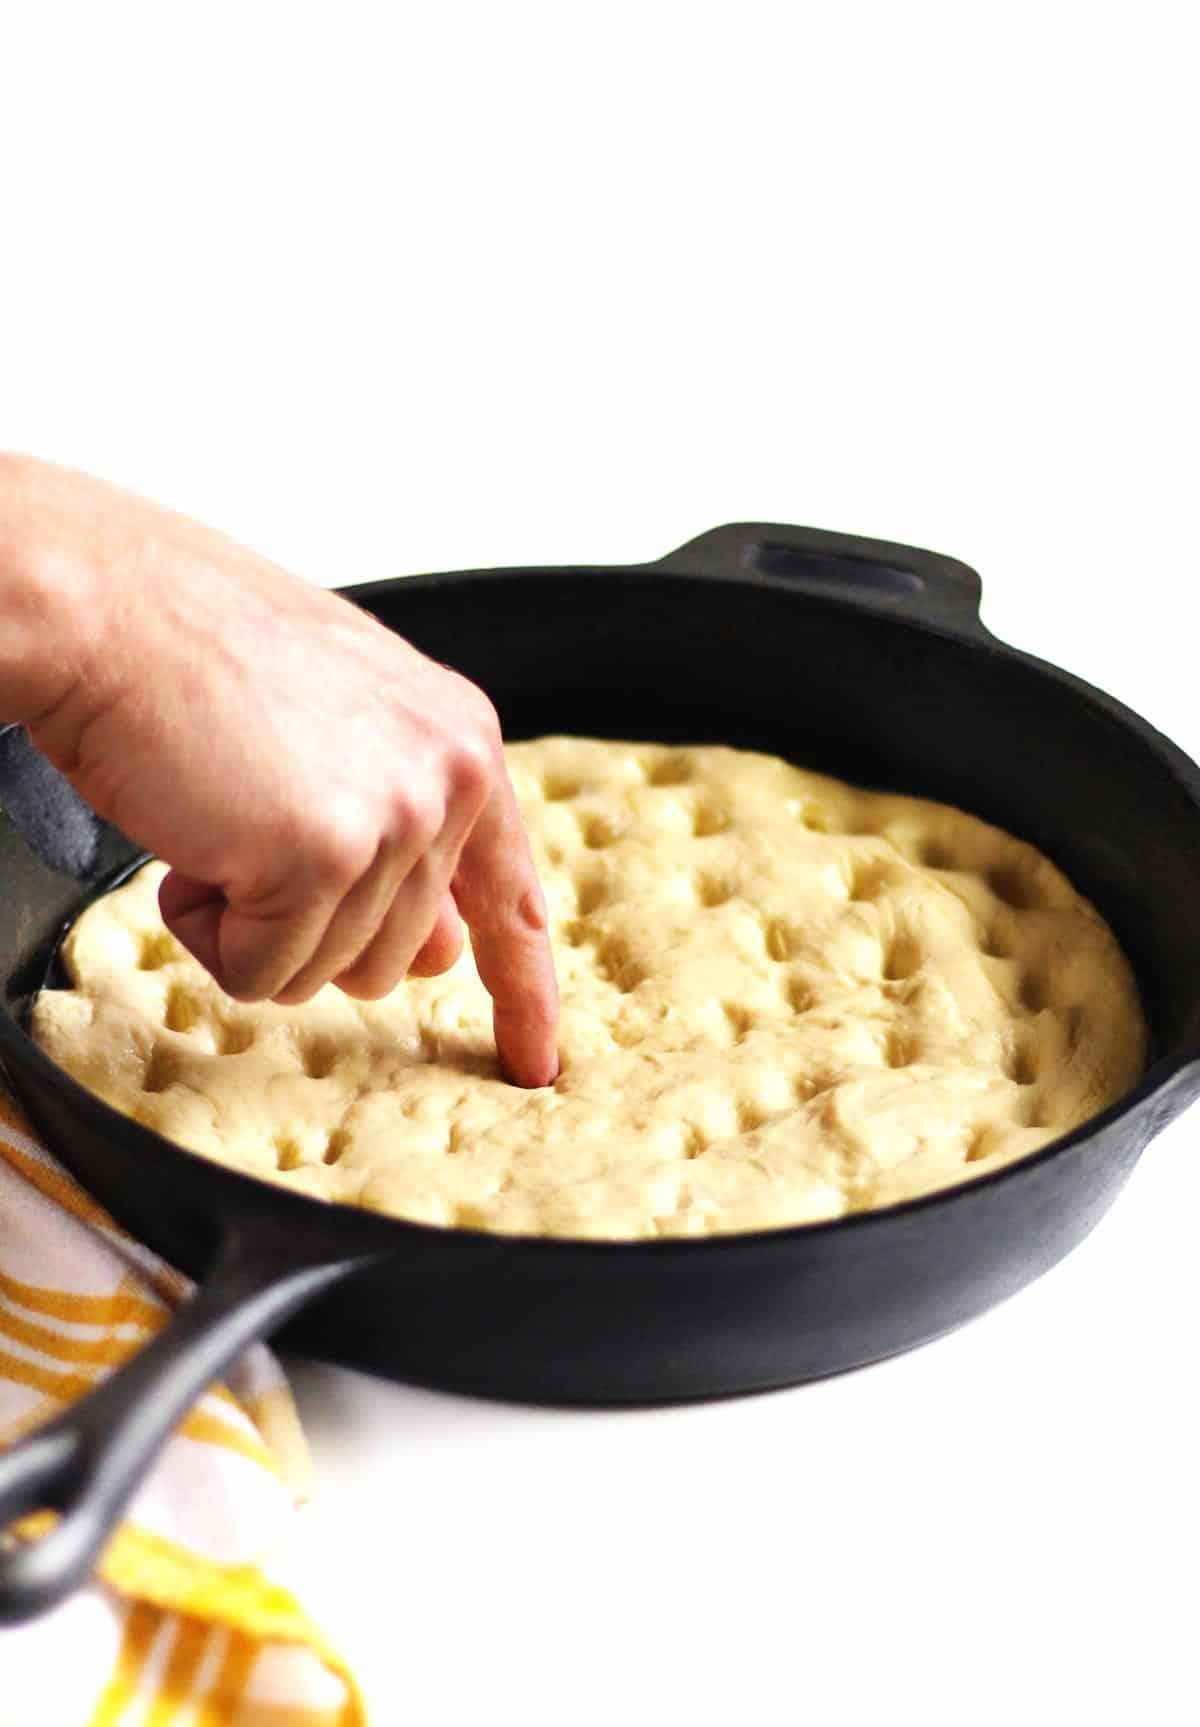 poking focaccia bread dimples